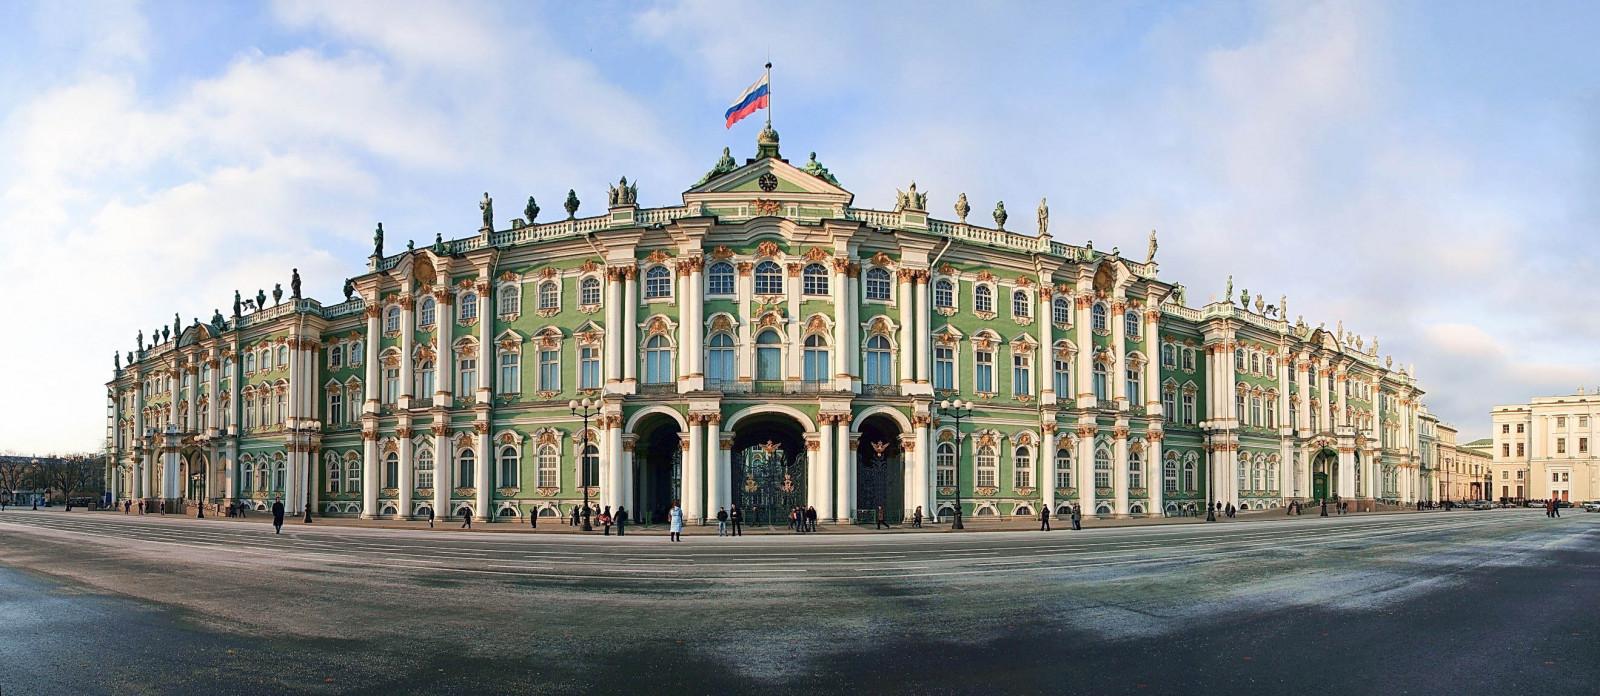 Baggrunde Hermitage Vinterpaladset Sankt Petersborg 2639x1149